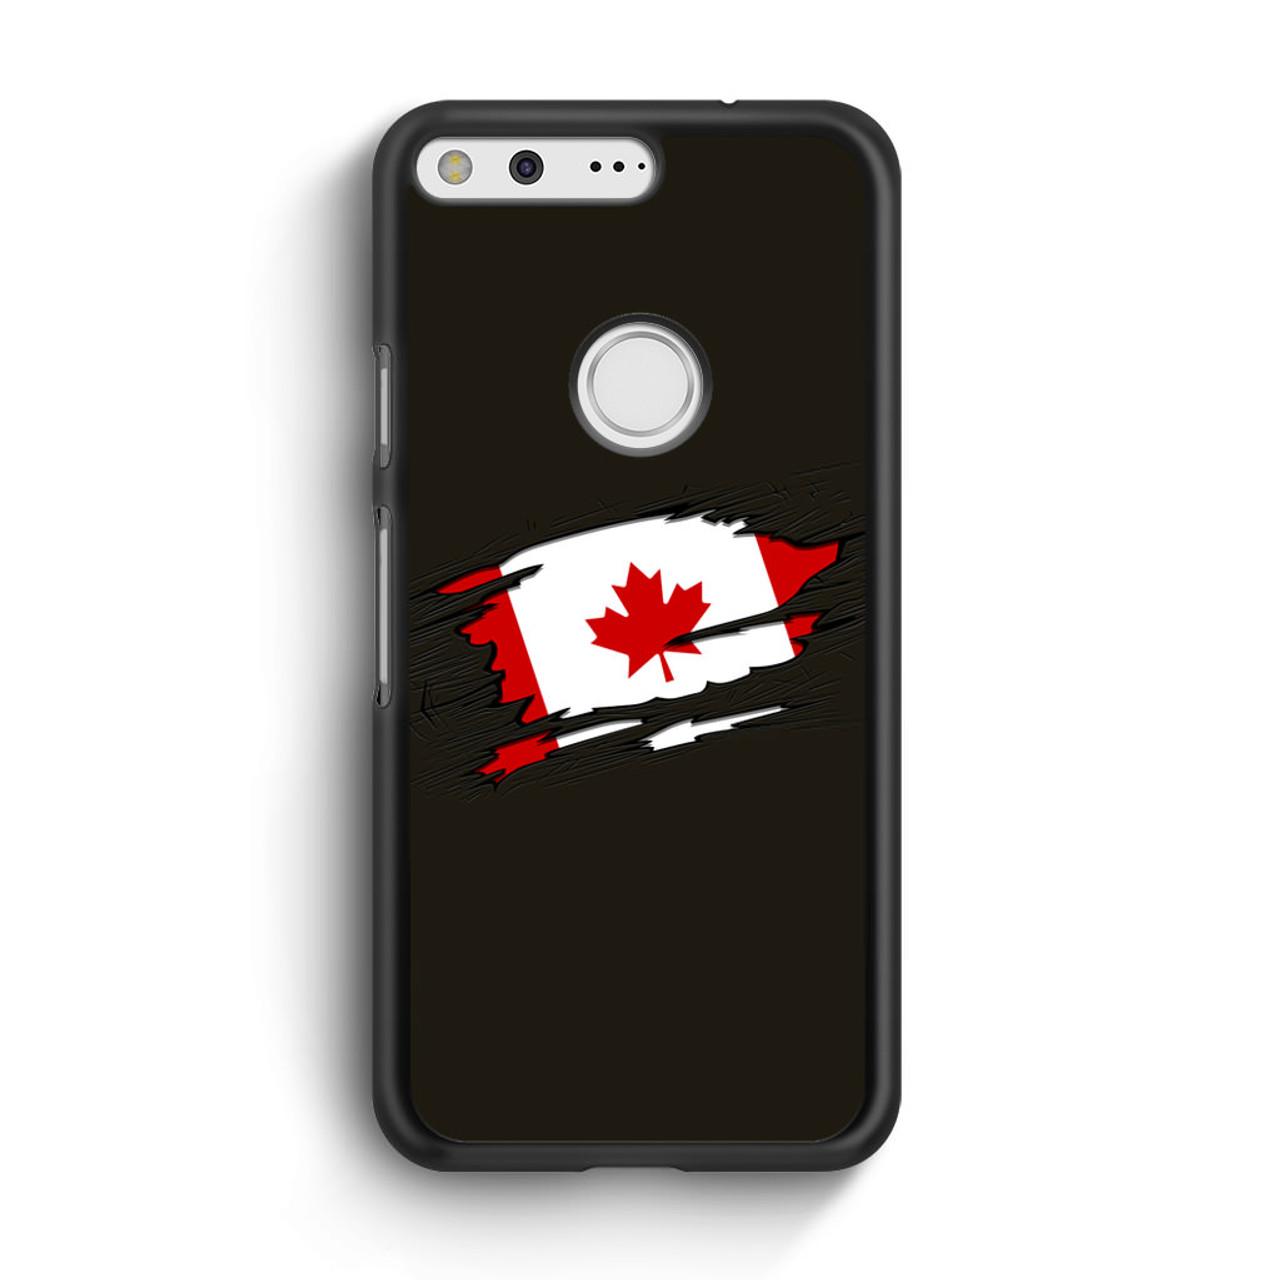 sale retailer 5632c 13fa8 Canadian Flag Google Pixel Case